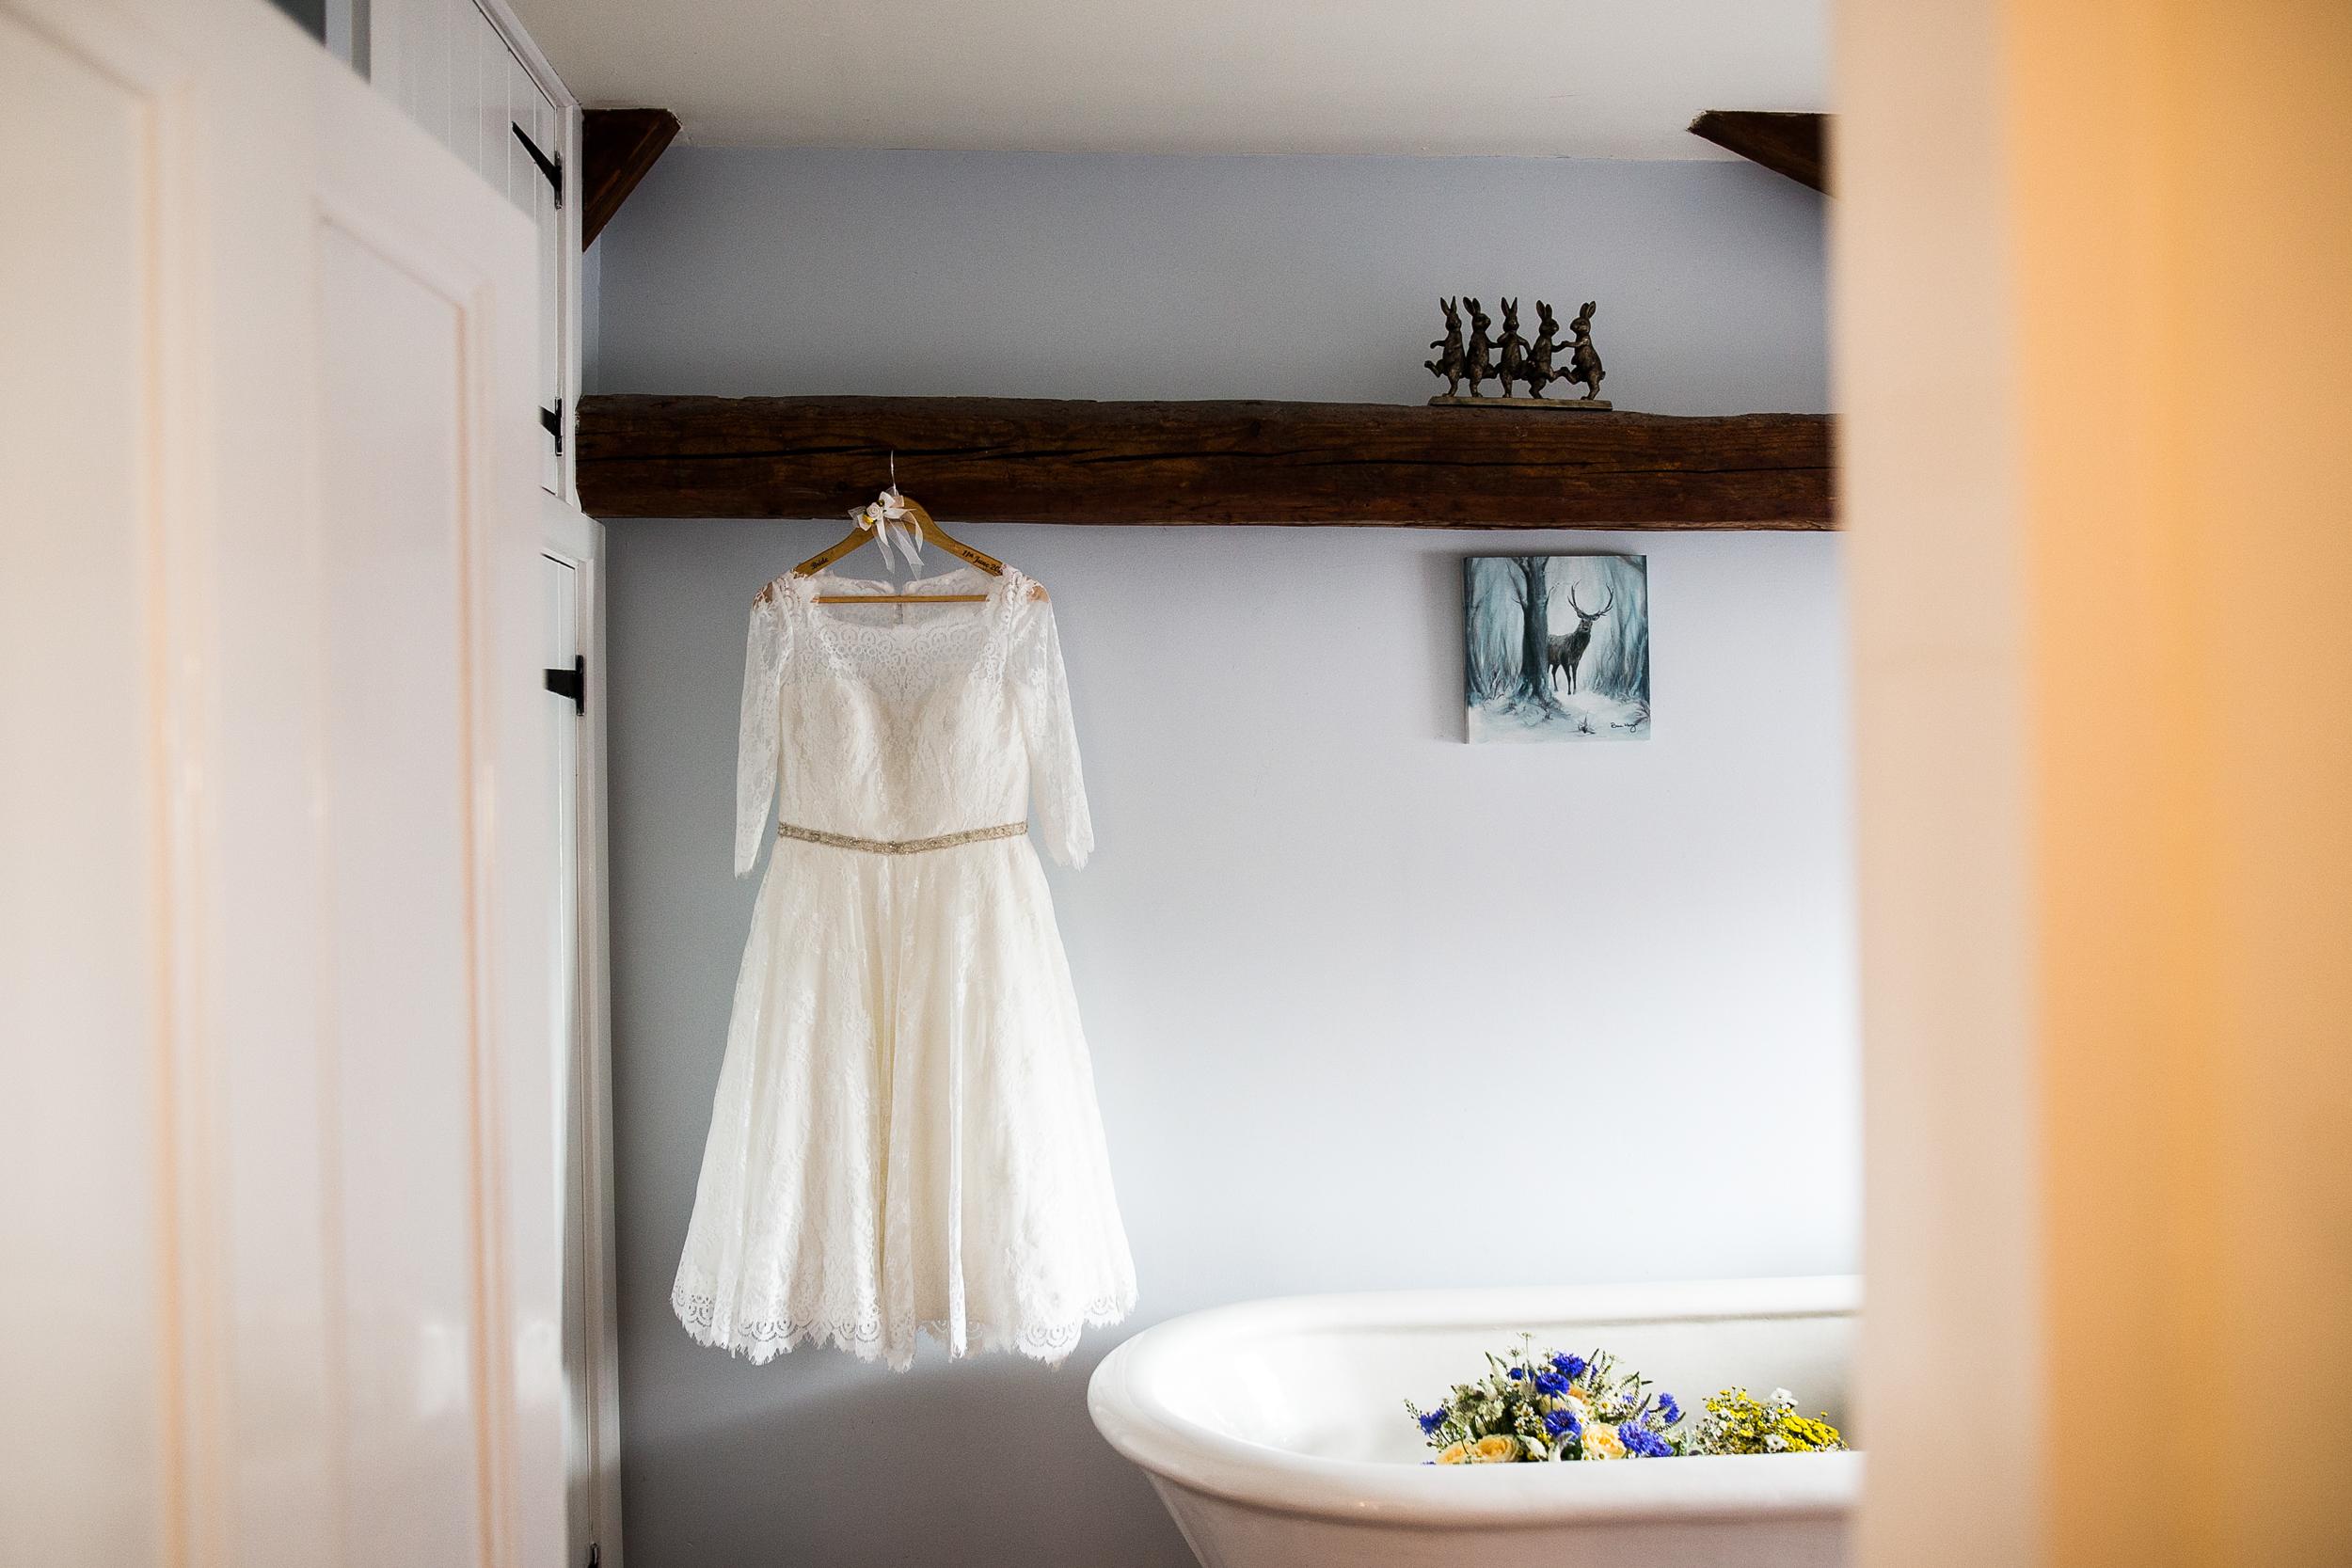 creative-wedding-photography-teesside-north-east-yorkshire-62.jpg